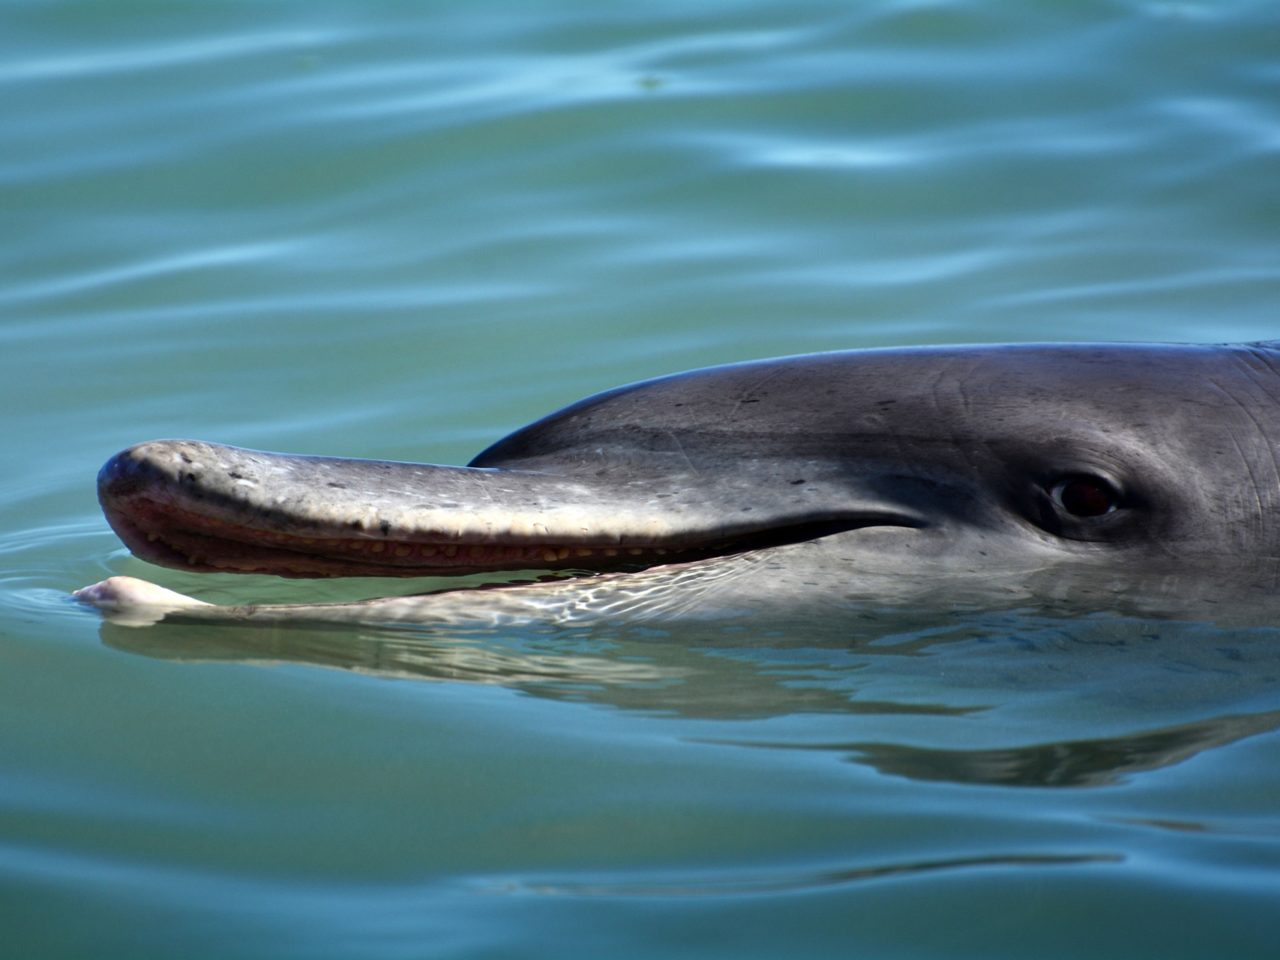 https://csjet.pl/wp-content/uploads/2021/06/Dolphin-Way-1280x960.jpg